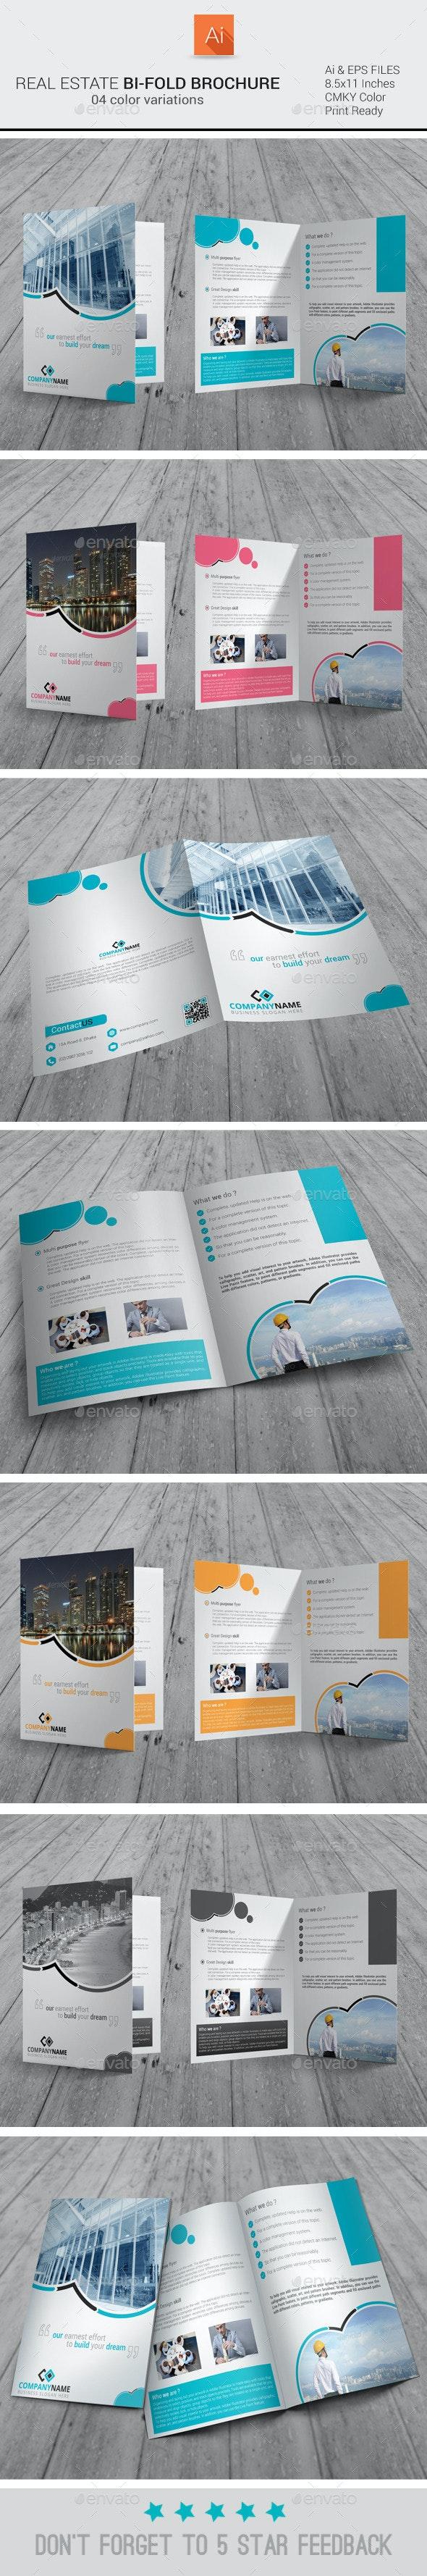 Real Estate Bi-fold Brochure - Corporate Brochures